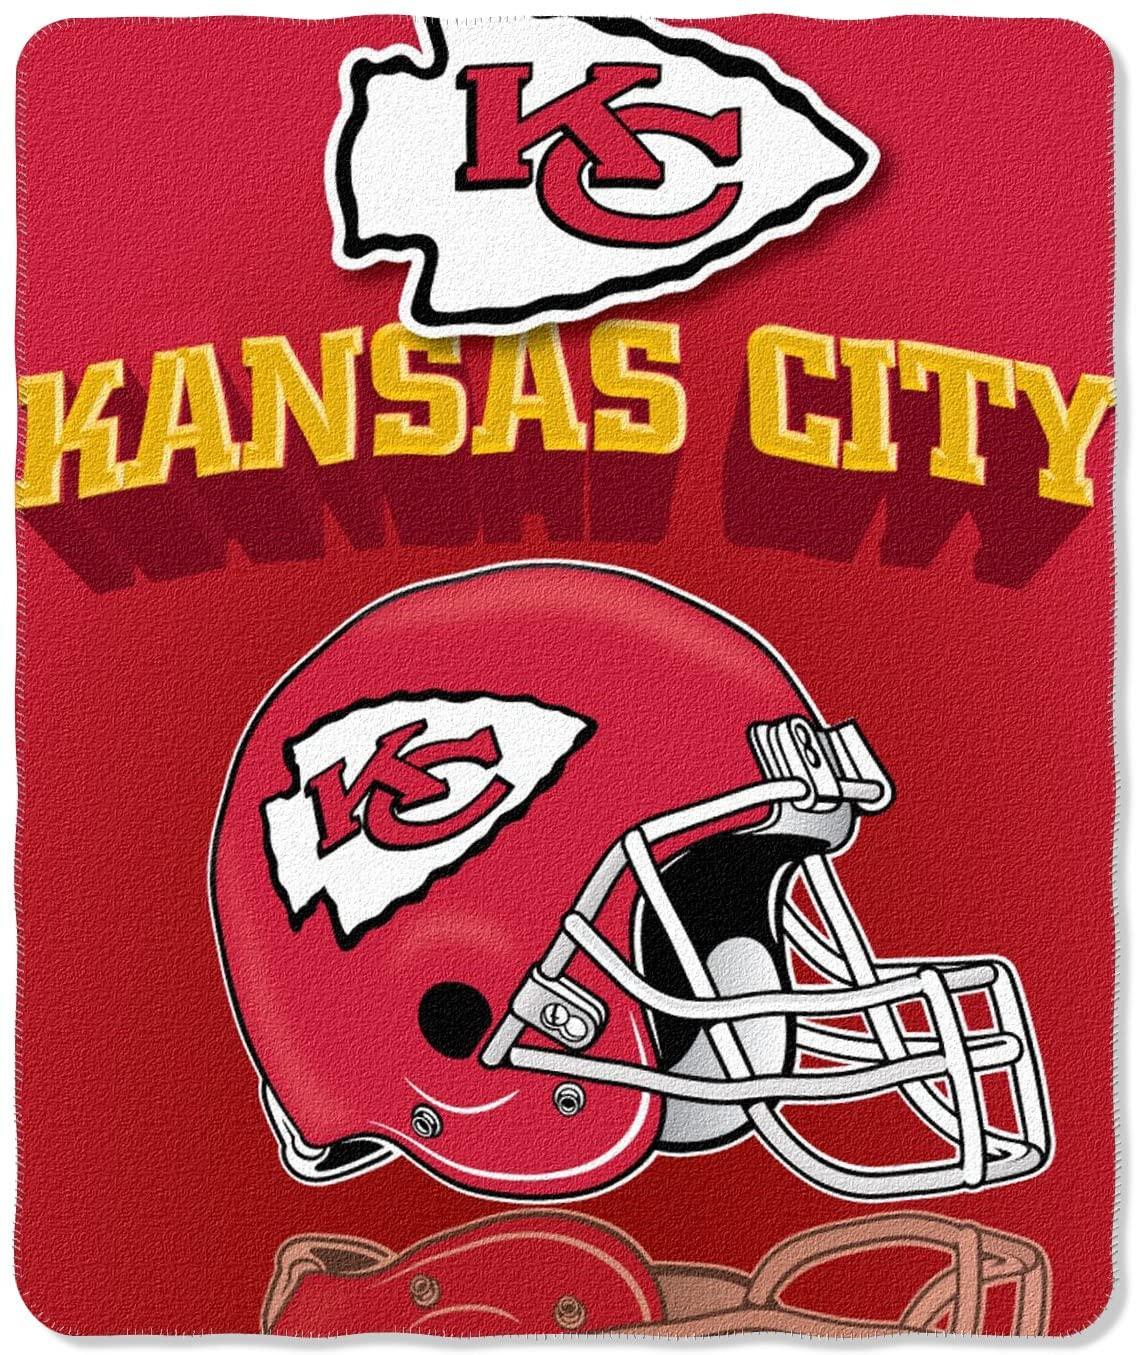 Nfl Throw Kansas City Chiefs Fleece Blanket